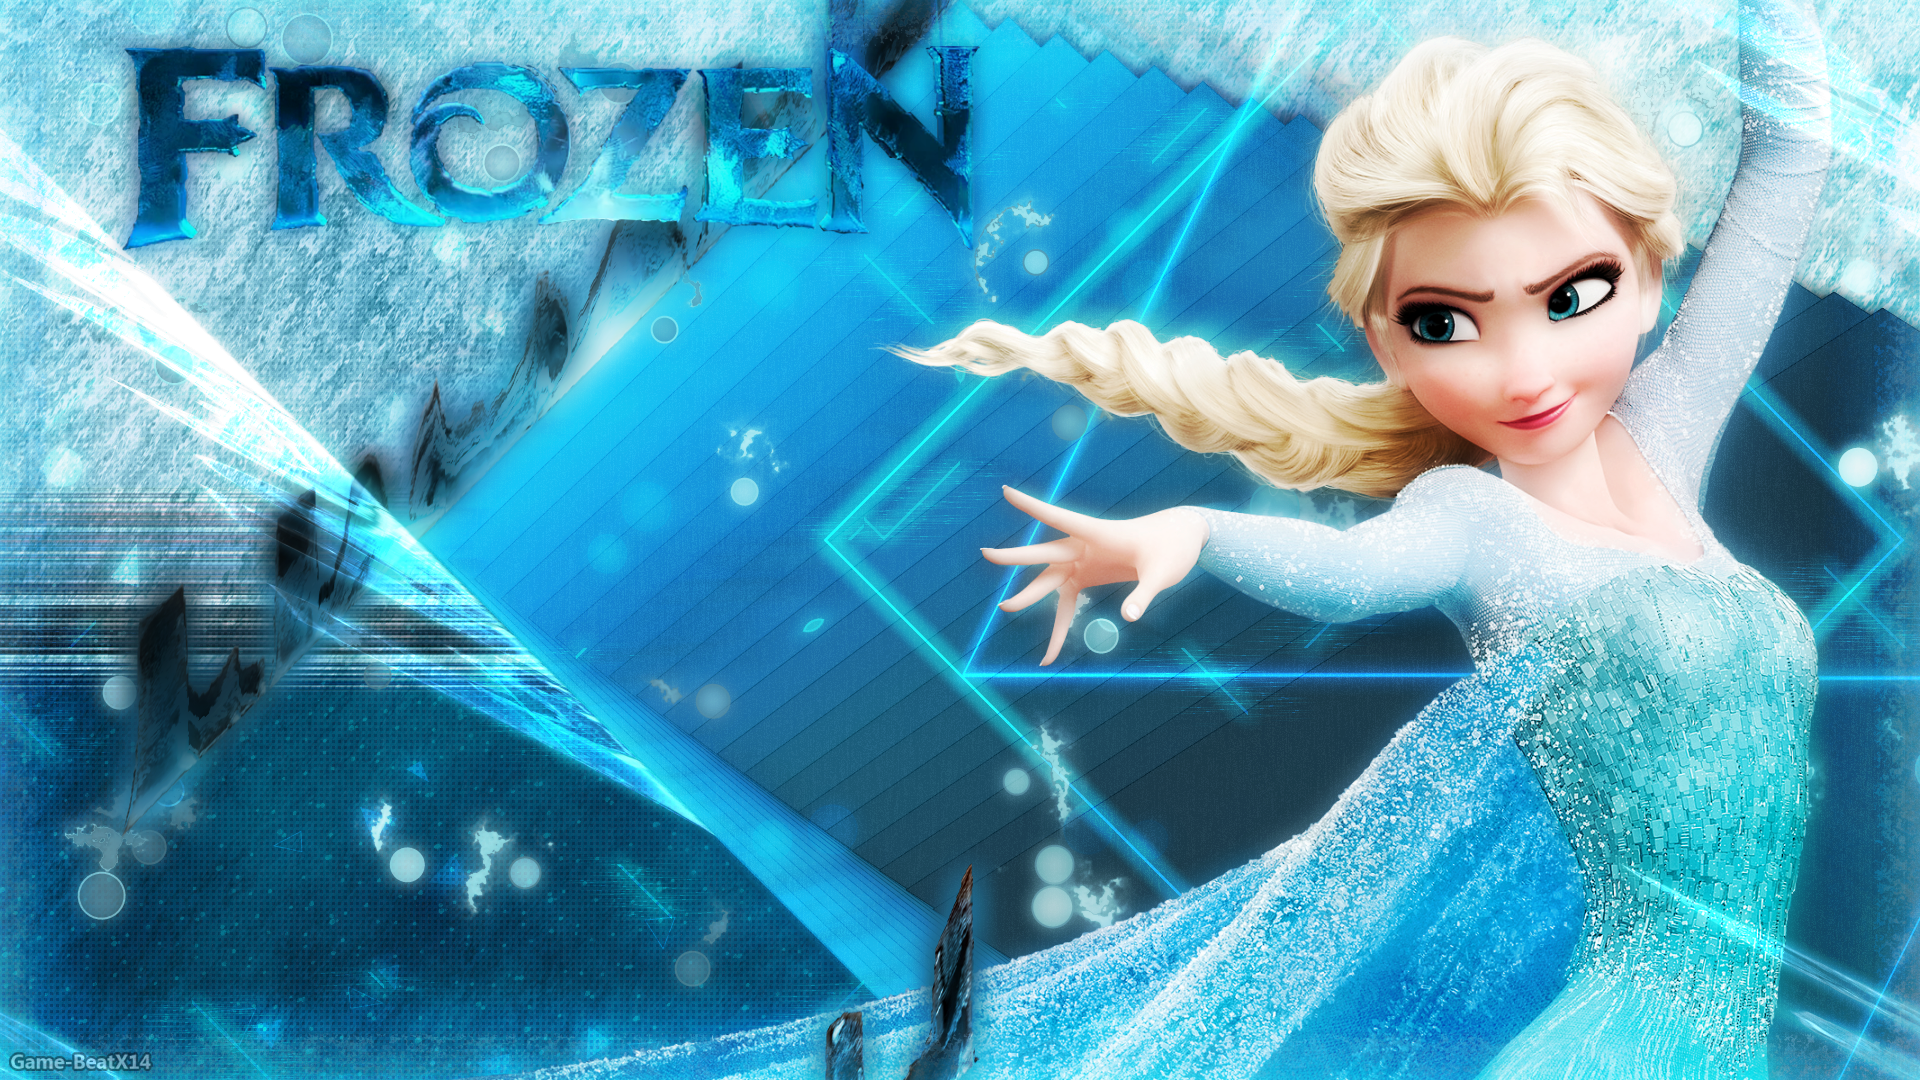 Frozen Wallpaper By Game Beatx14deviantartcom On At Deviantart